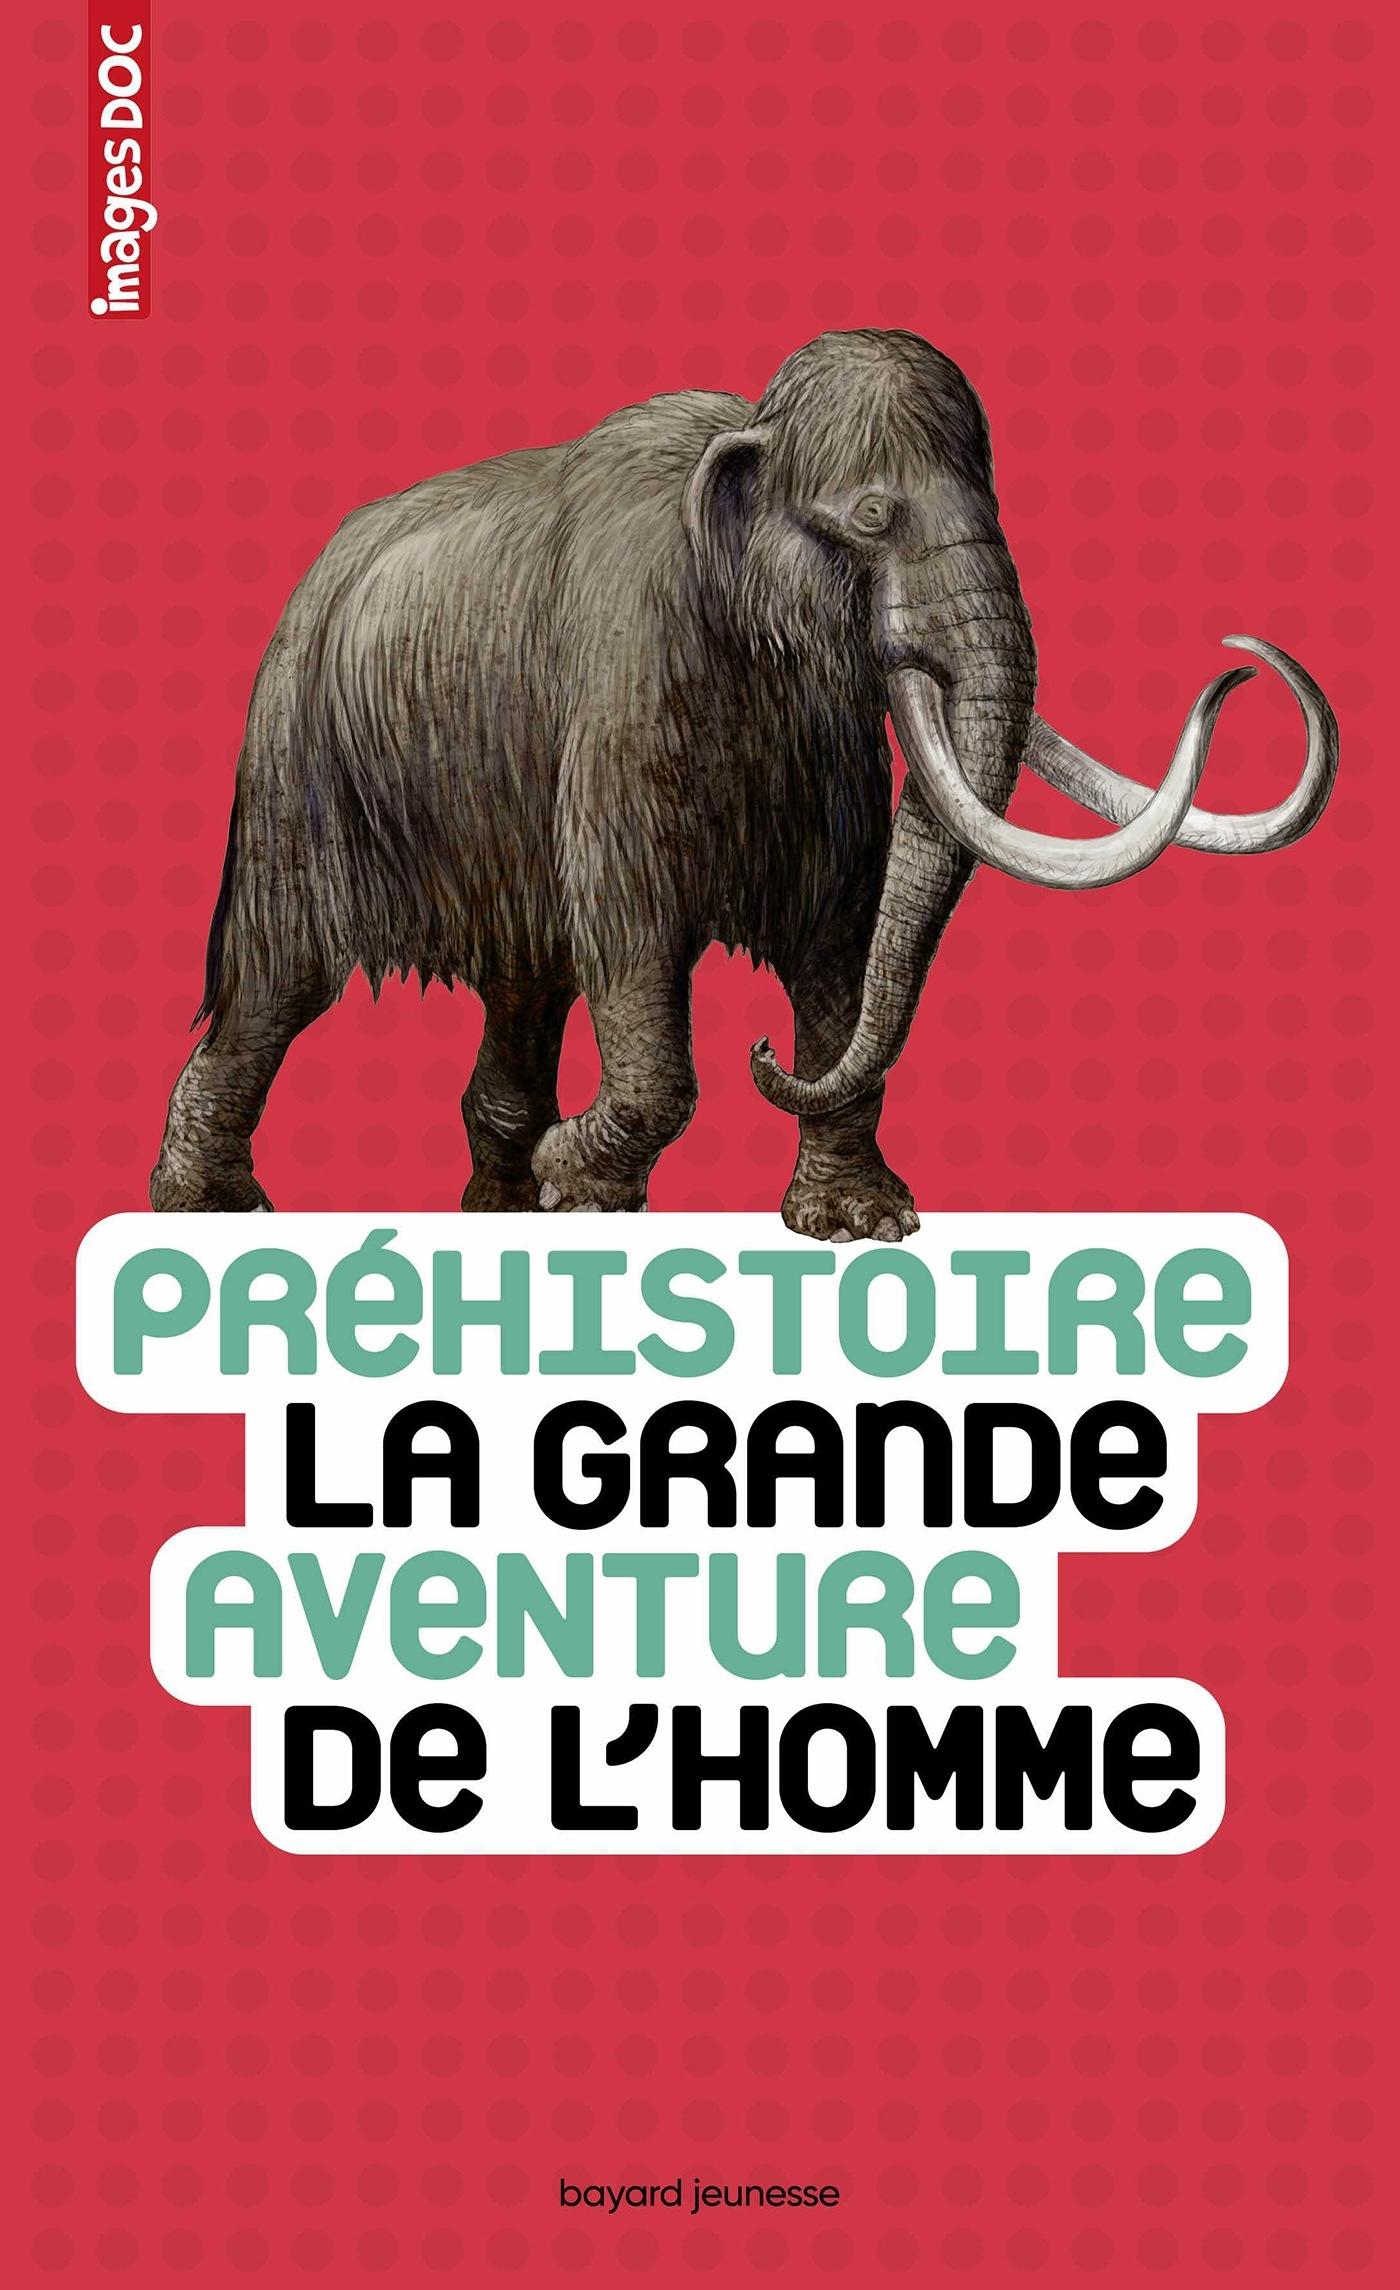 PREHISTOIRE, LA GRANDE AVENTURE DE L'HOMME